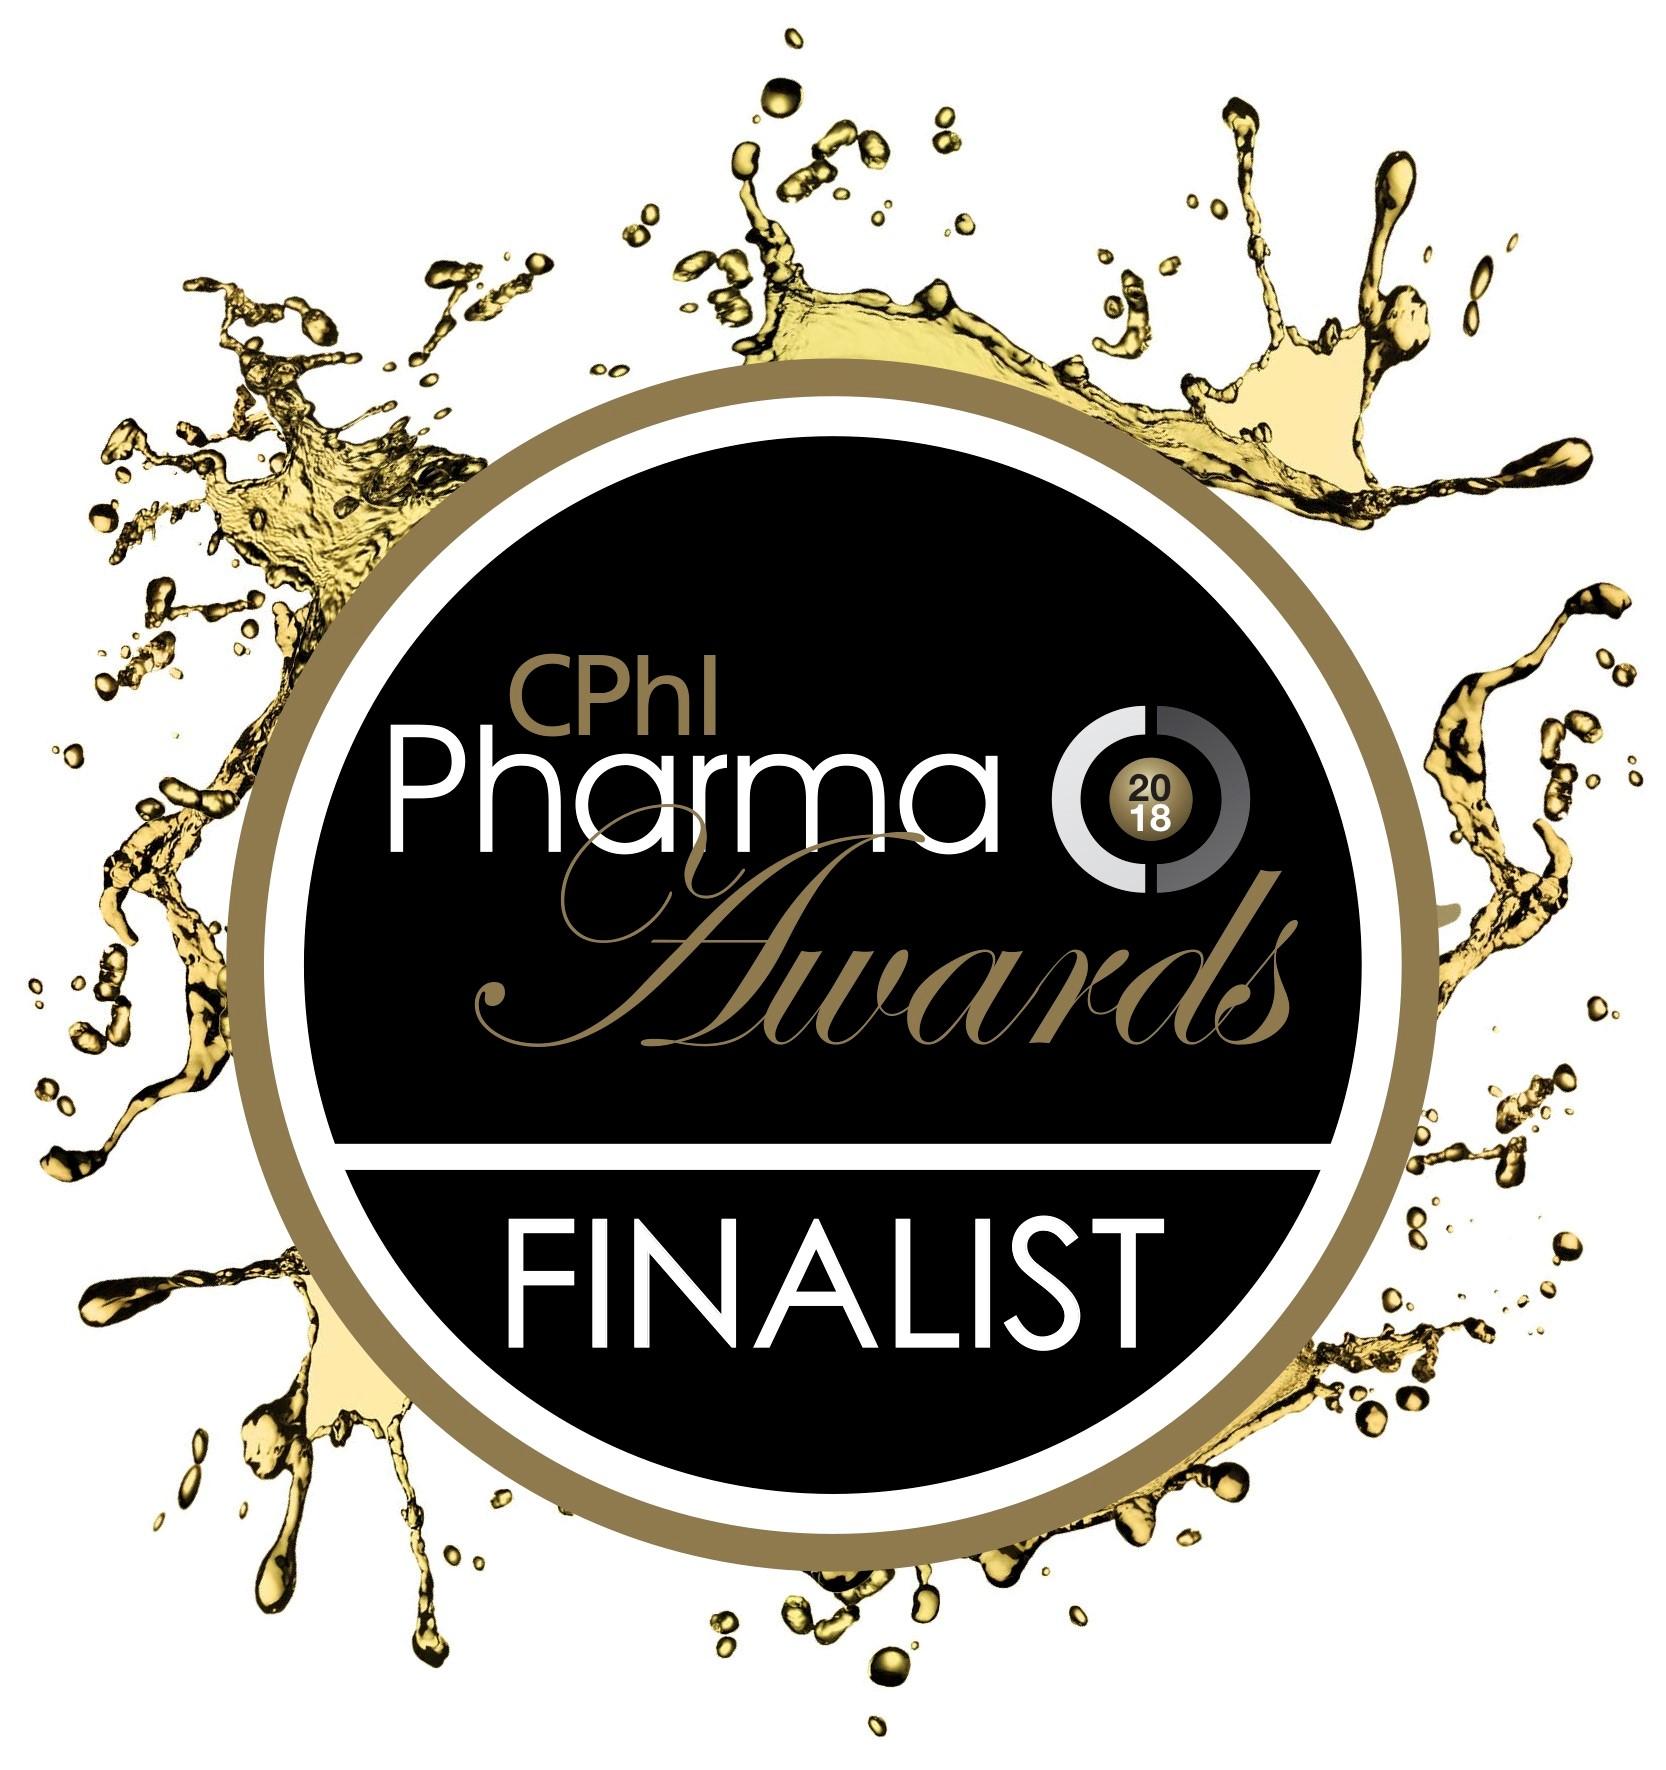 180927_CPhI_Pharma_finalist.jpg